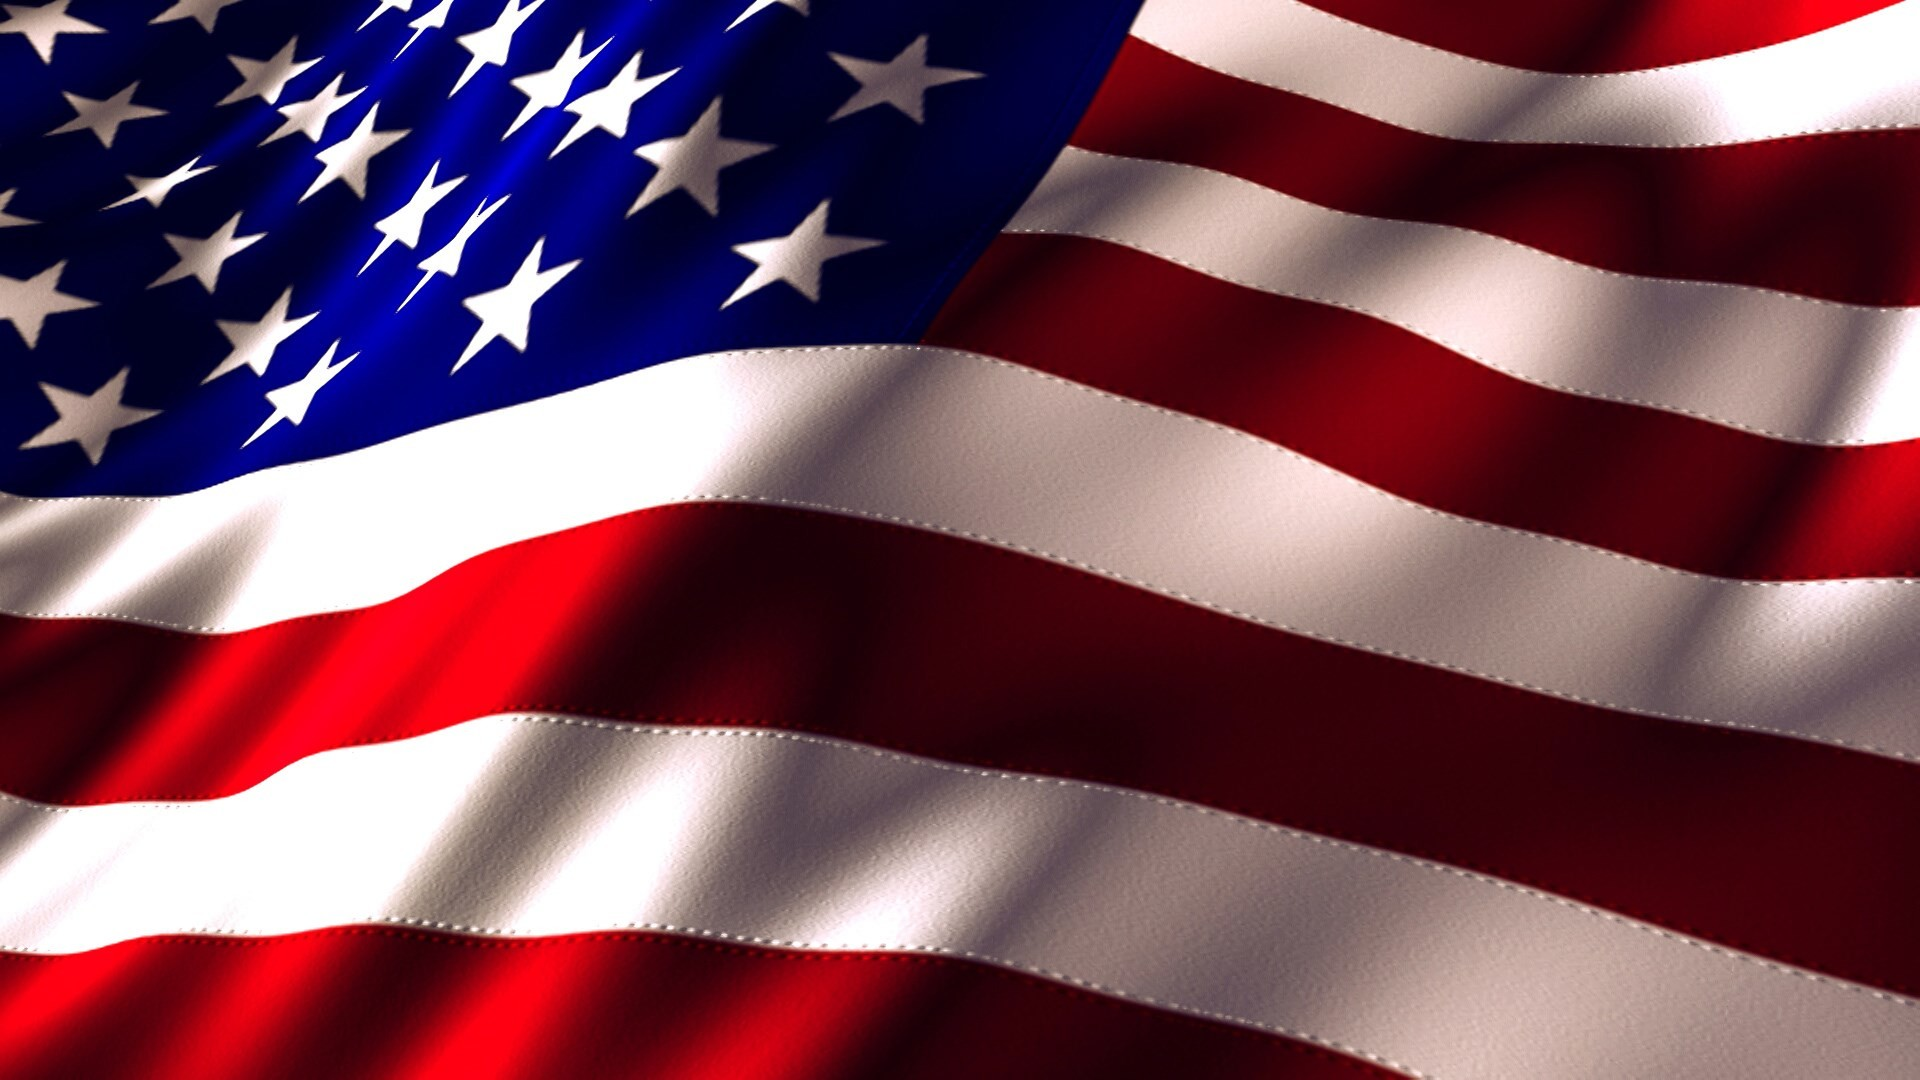 American Flag Wallpaper iPhone